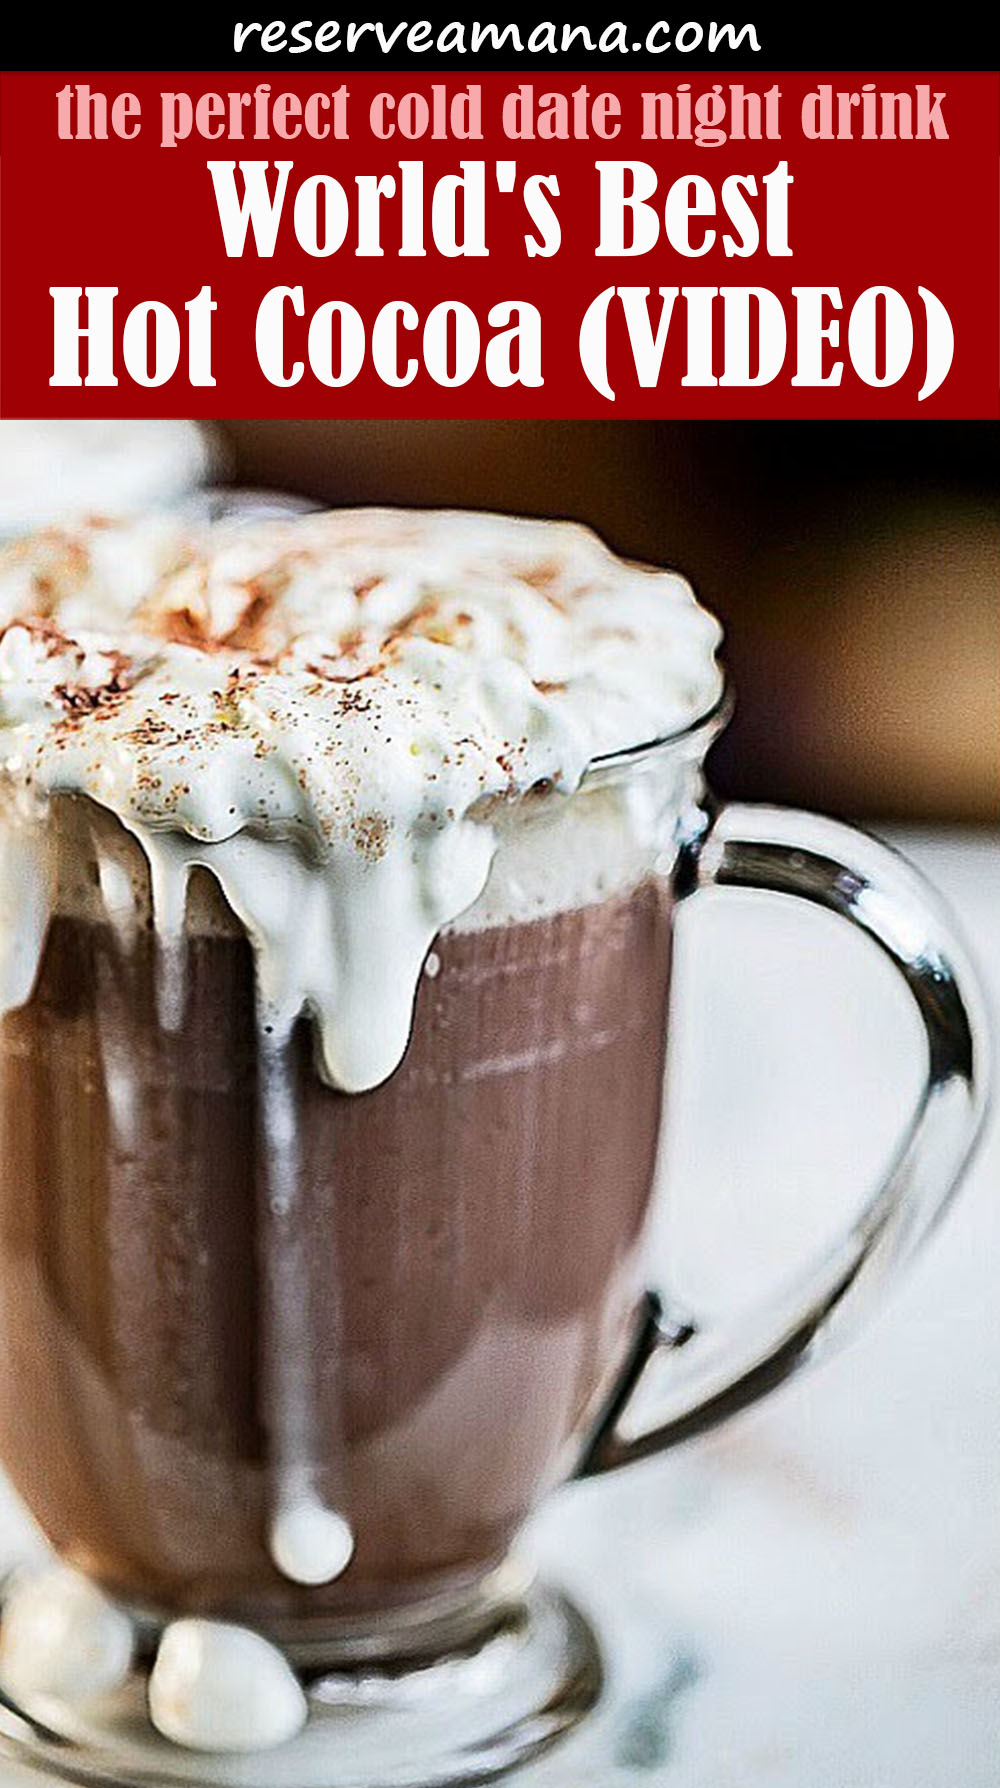 World's Best Hot Cocoa Recipe